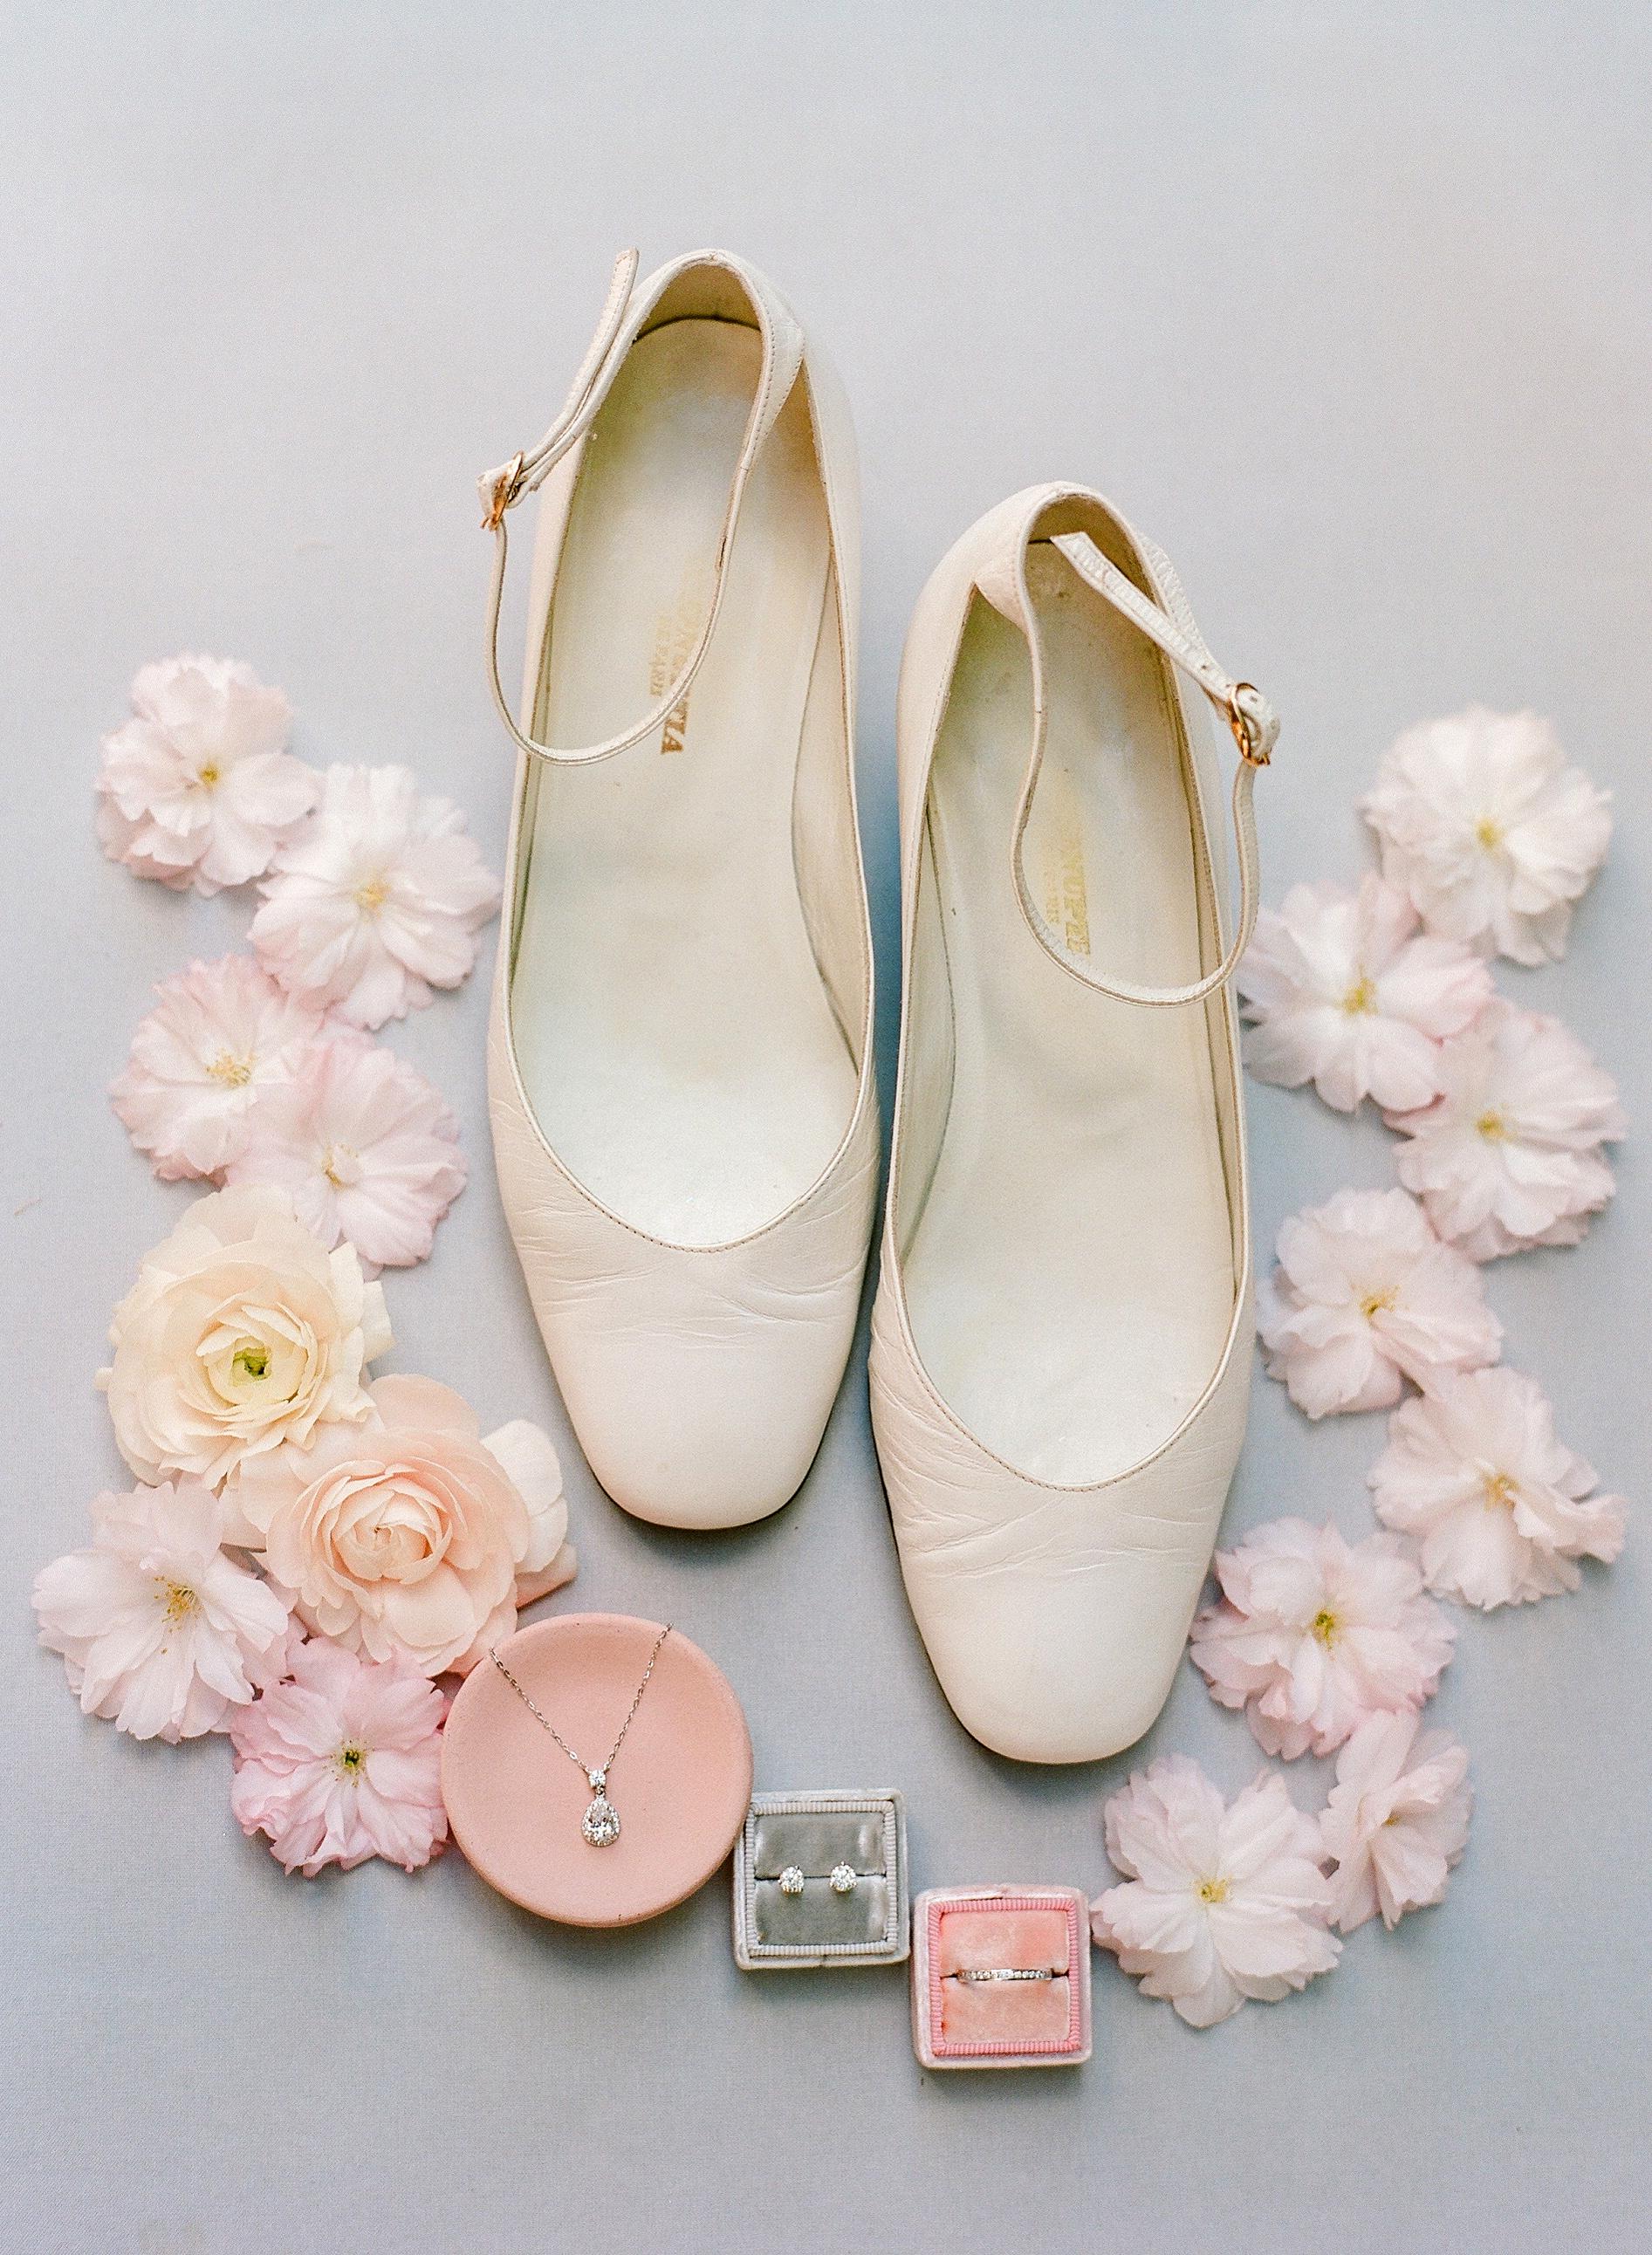 mechelle julia wedding nude shoes and jewelry